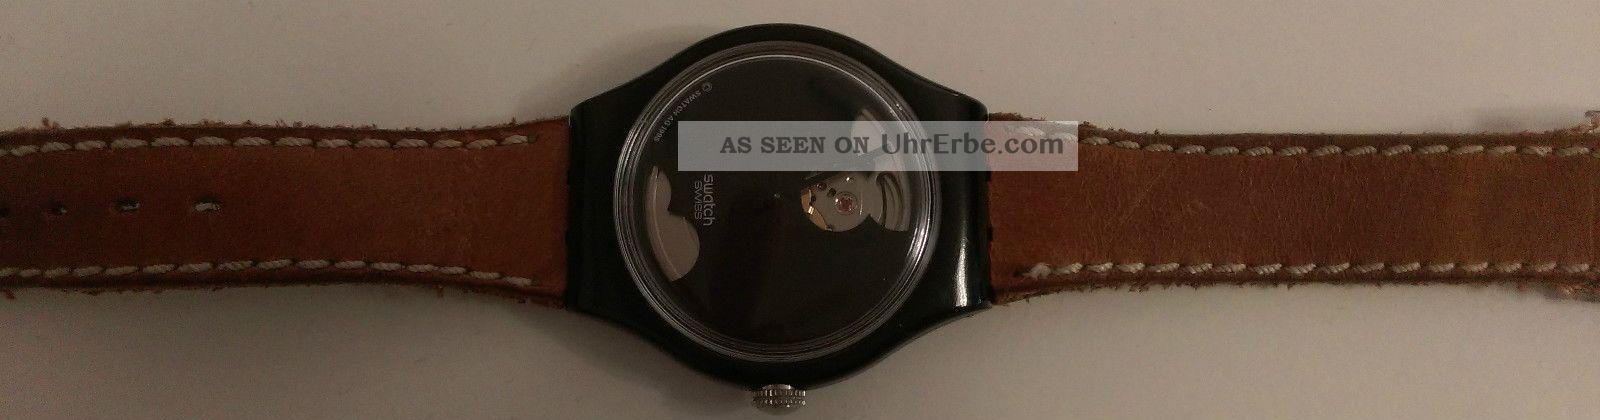 Swatch Automatik Uhr Armbanduhren Bild